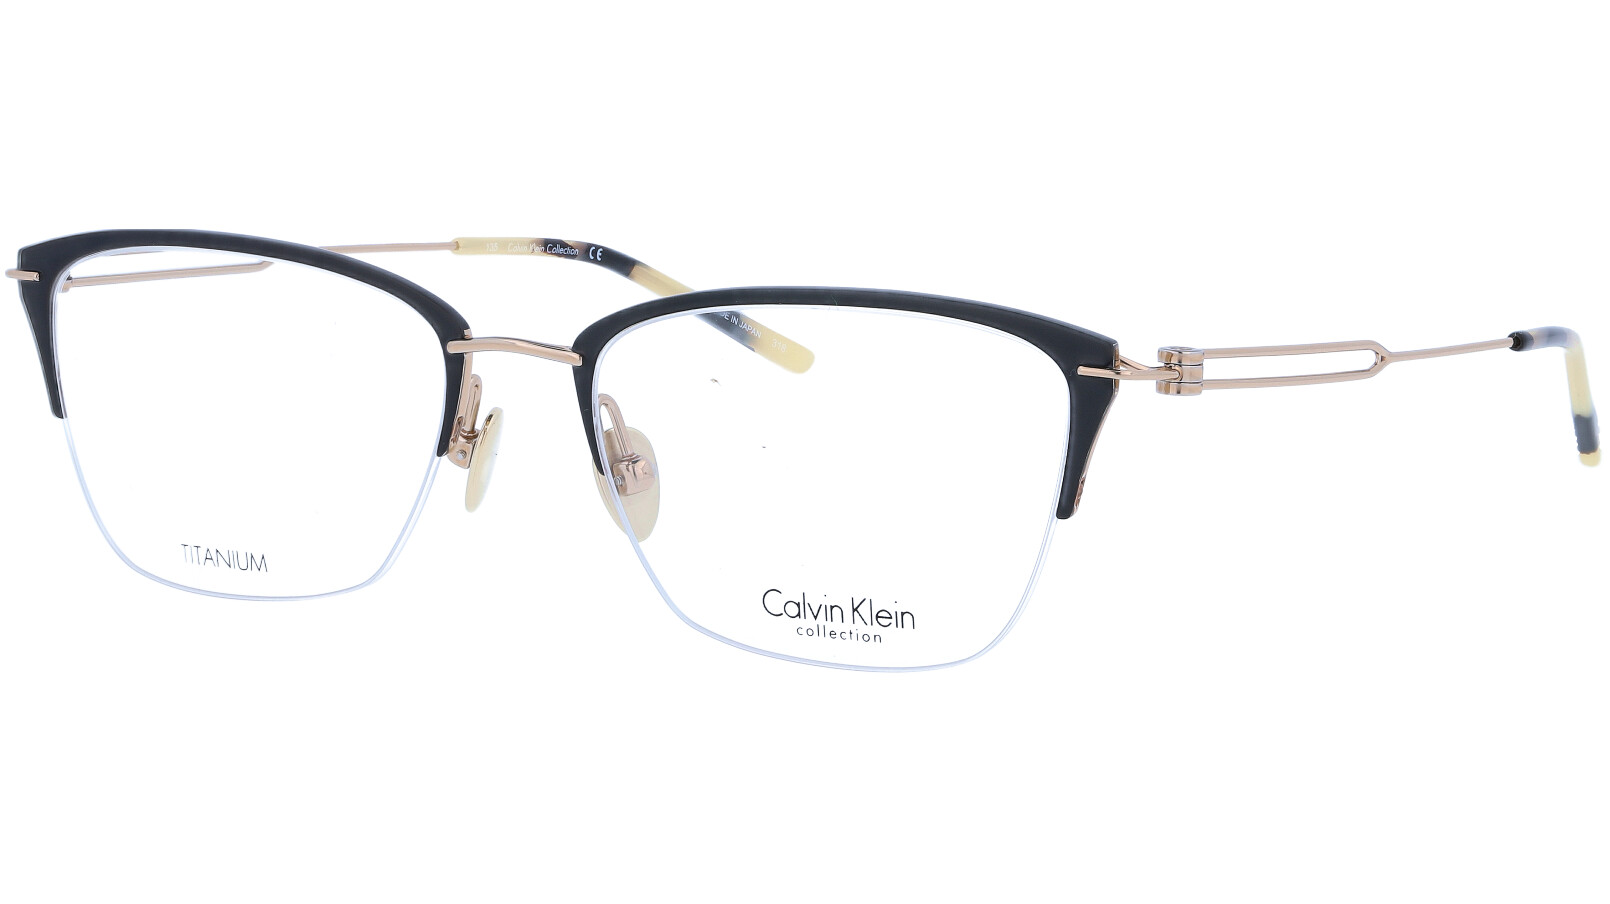 CALVIN KLEIN CK8065 007 52 BLACK Glasses